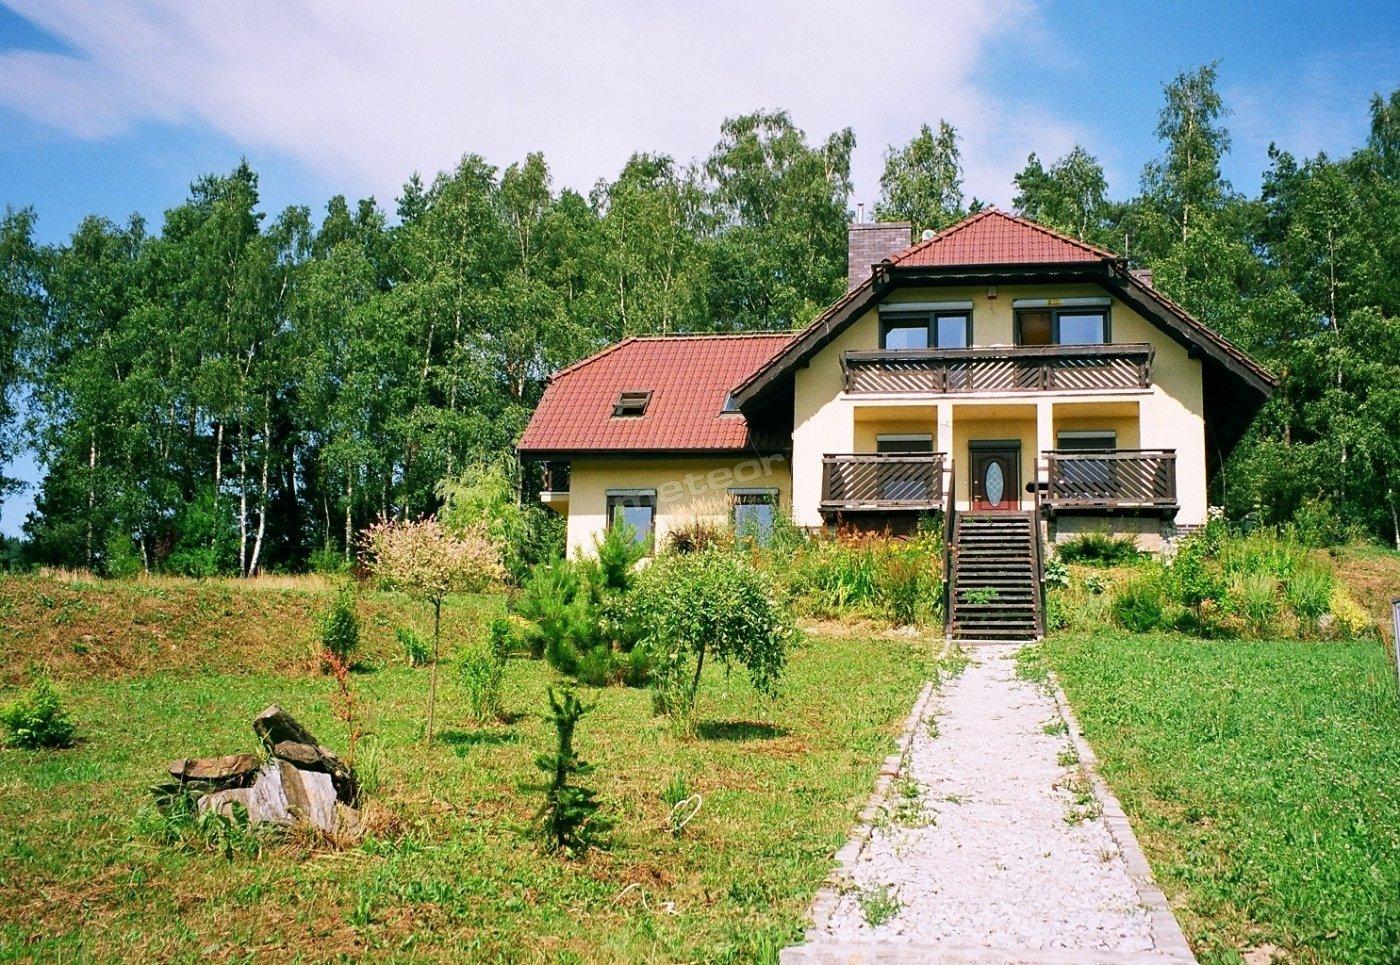 Landtouristik Markowe Wzgórze